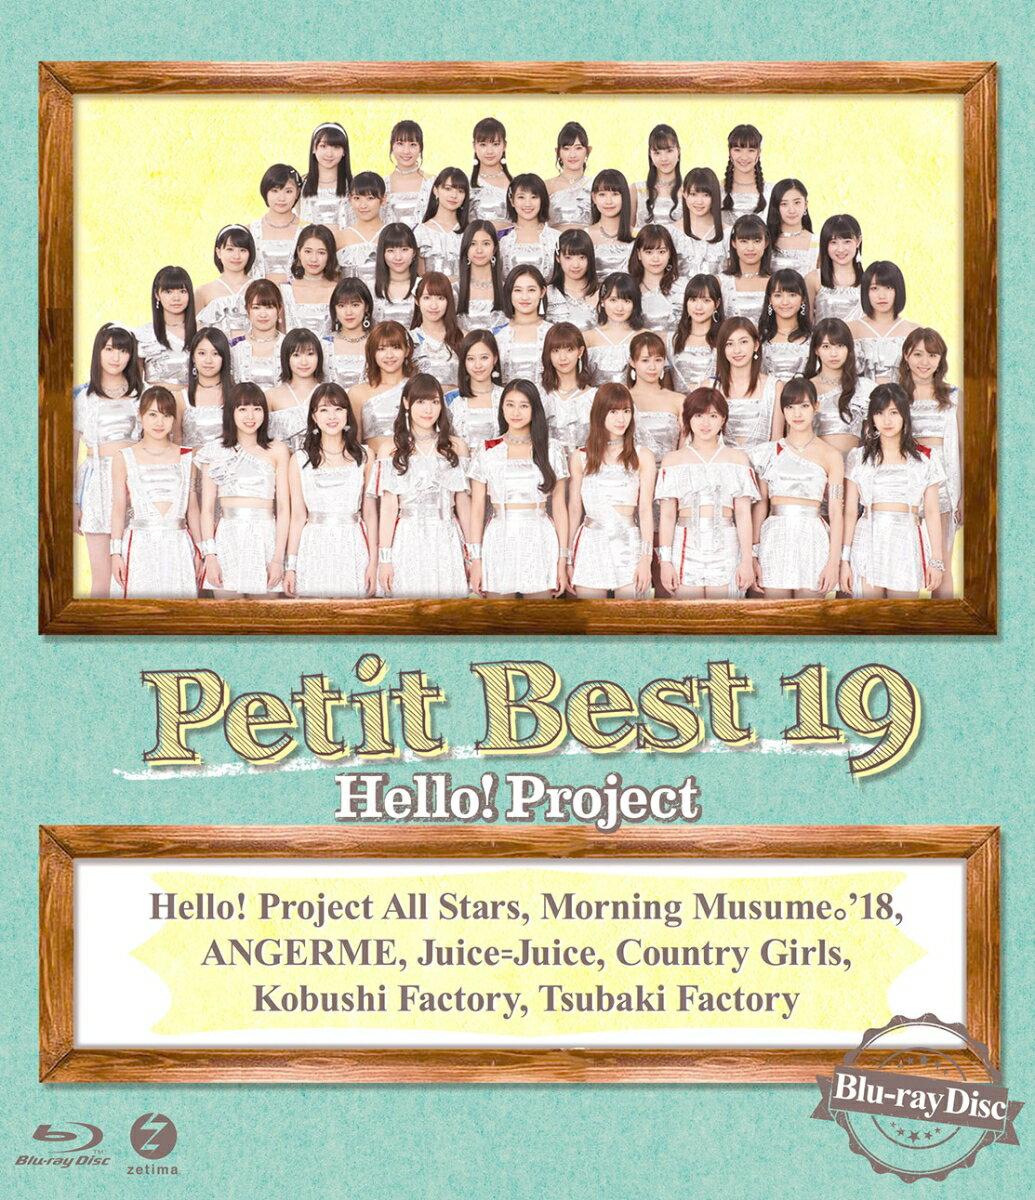 https://thumbnail.image.rakuten.co.jp/@0_mall/book/cabinet/9536/4942463529536.jpg